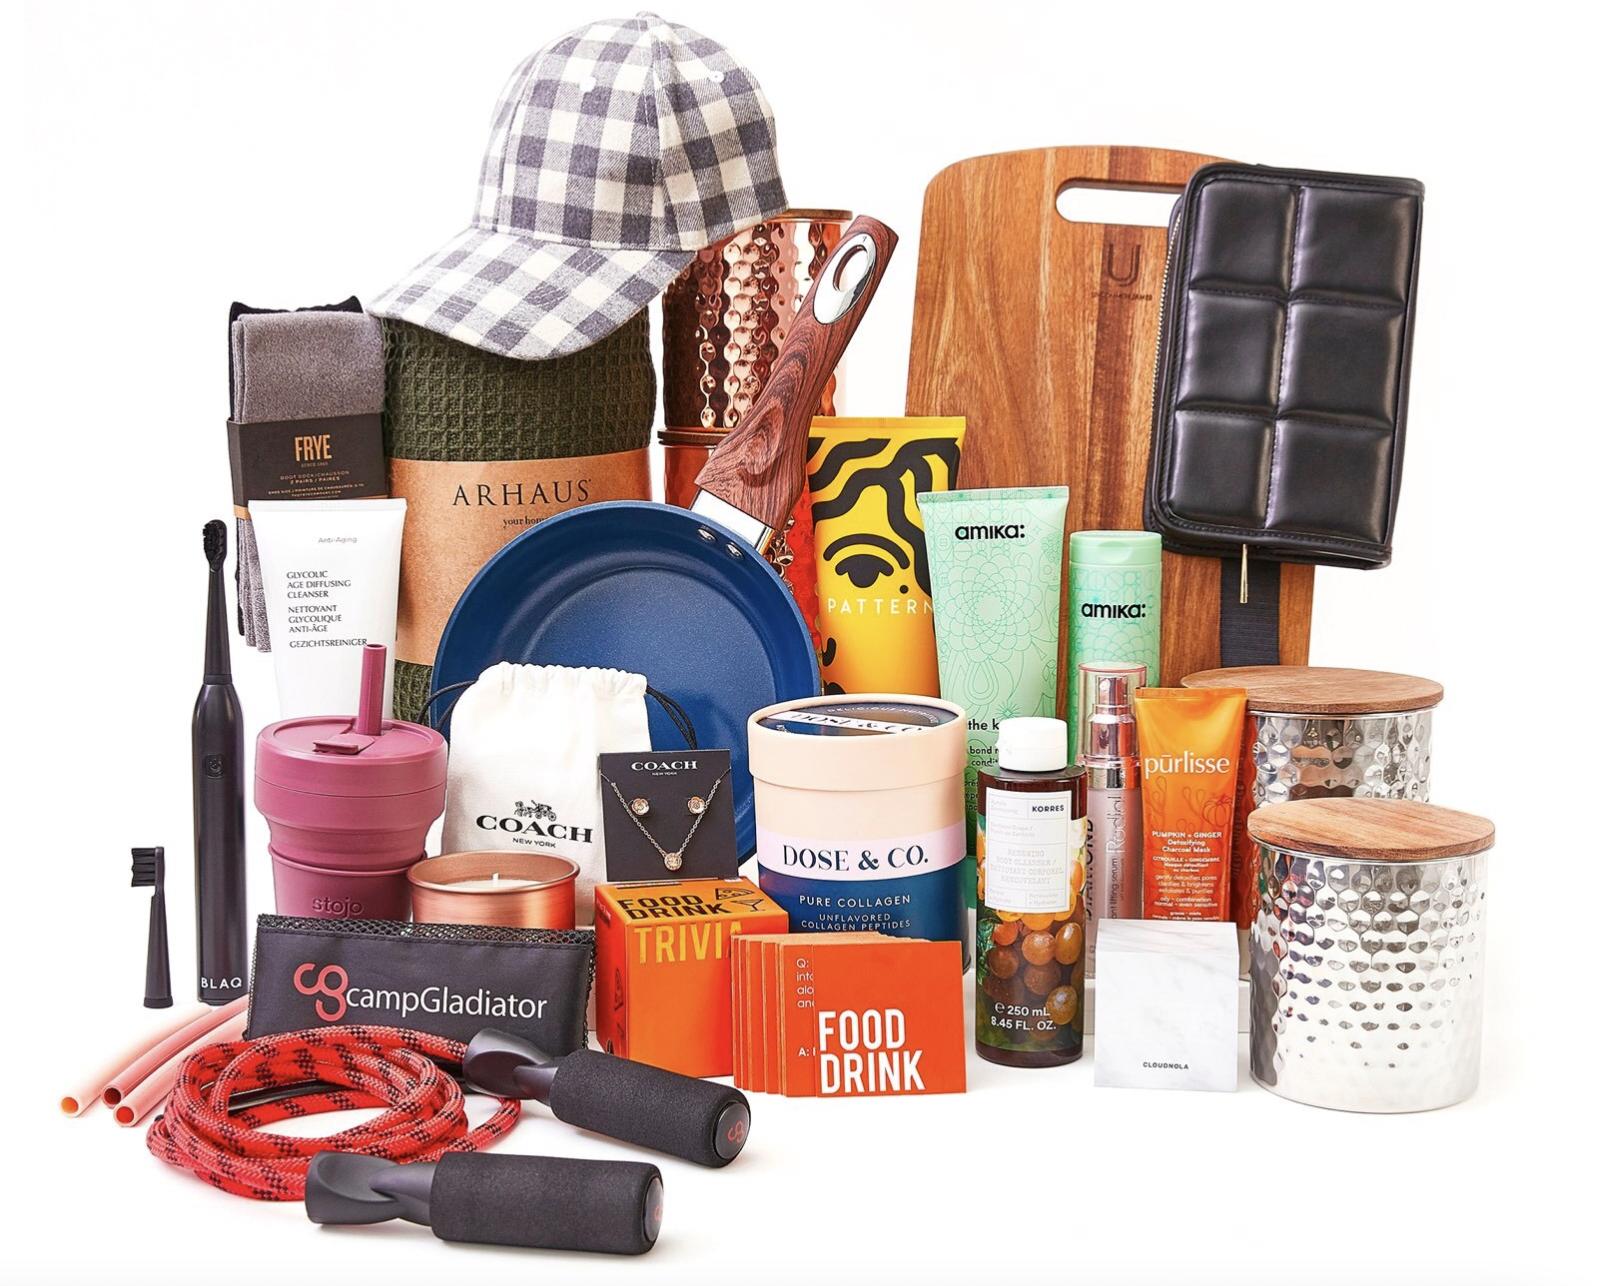 FabFitFun fall 2021 box showing a variety of beauty, wellness, fashion, fitness, home and tech items